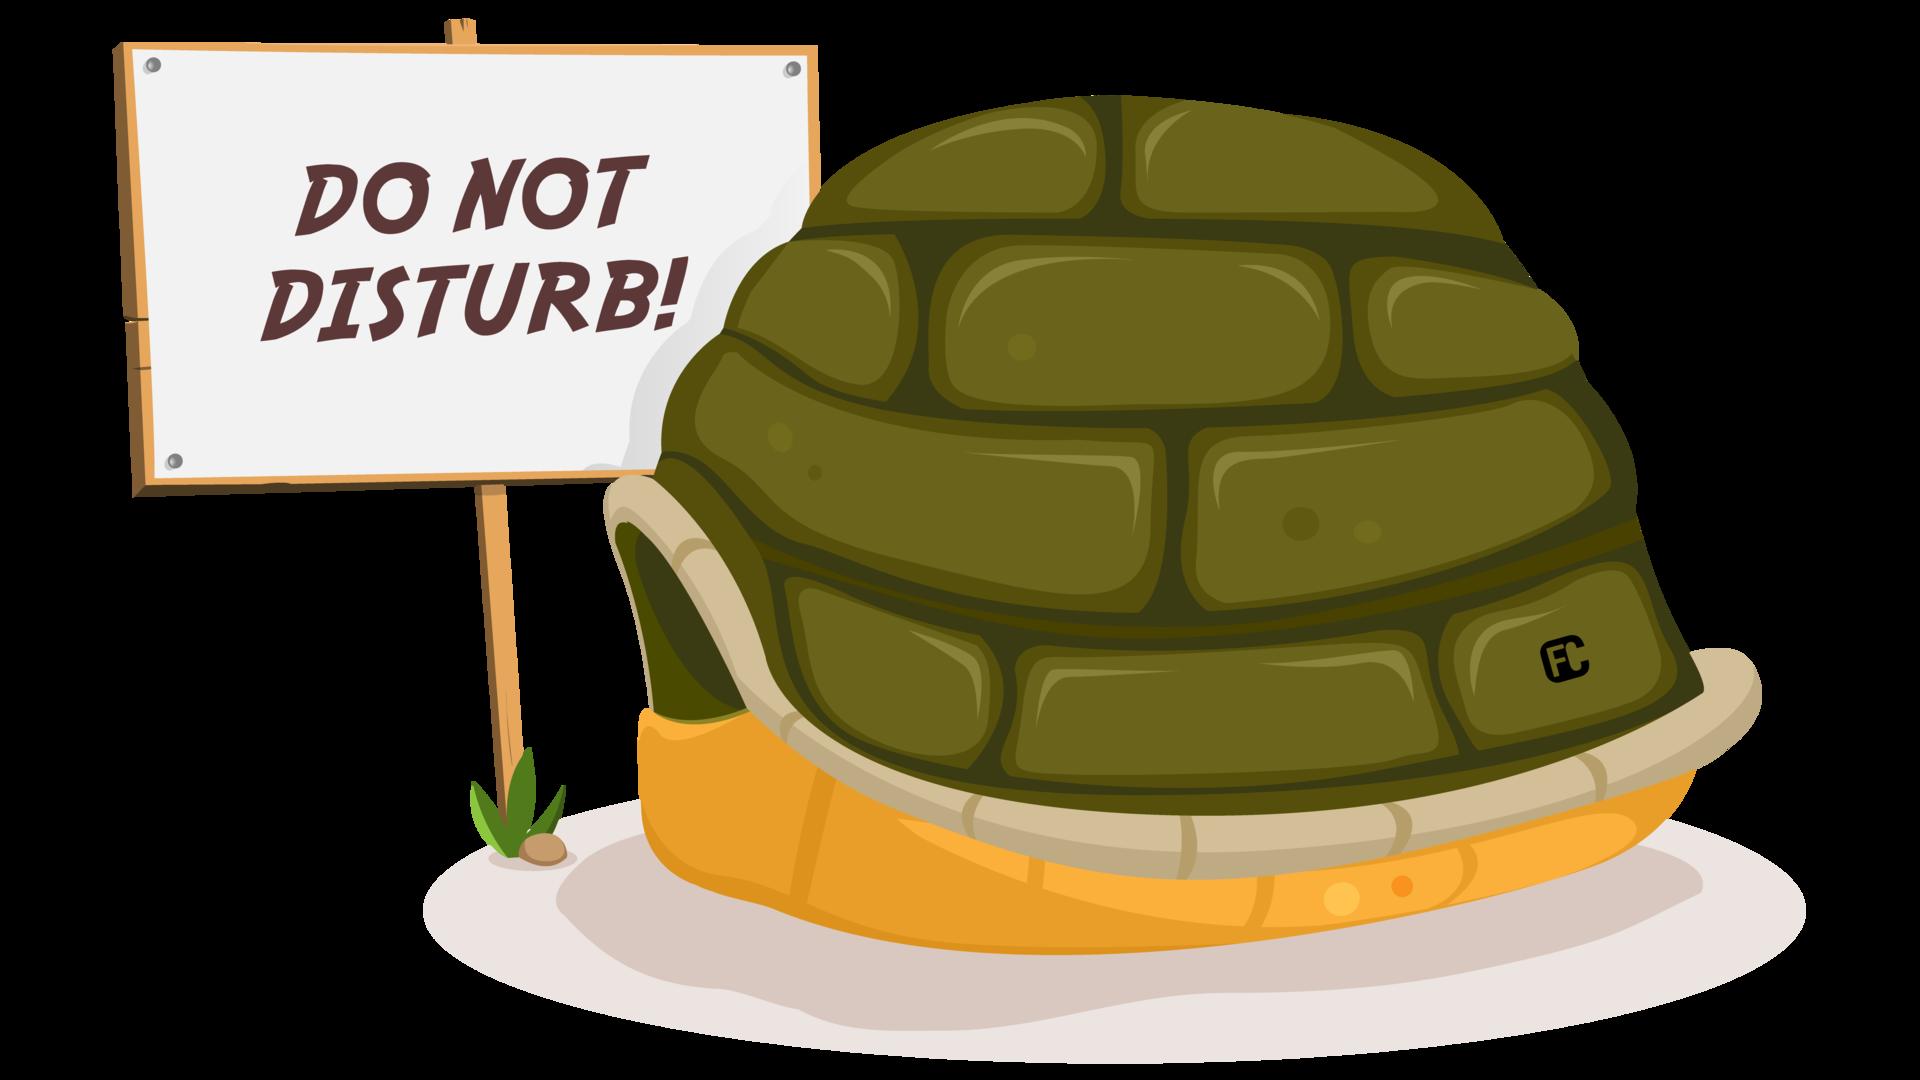 cartoon-turtle-do-not-disturb-fc